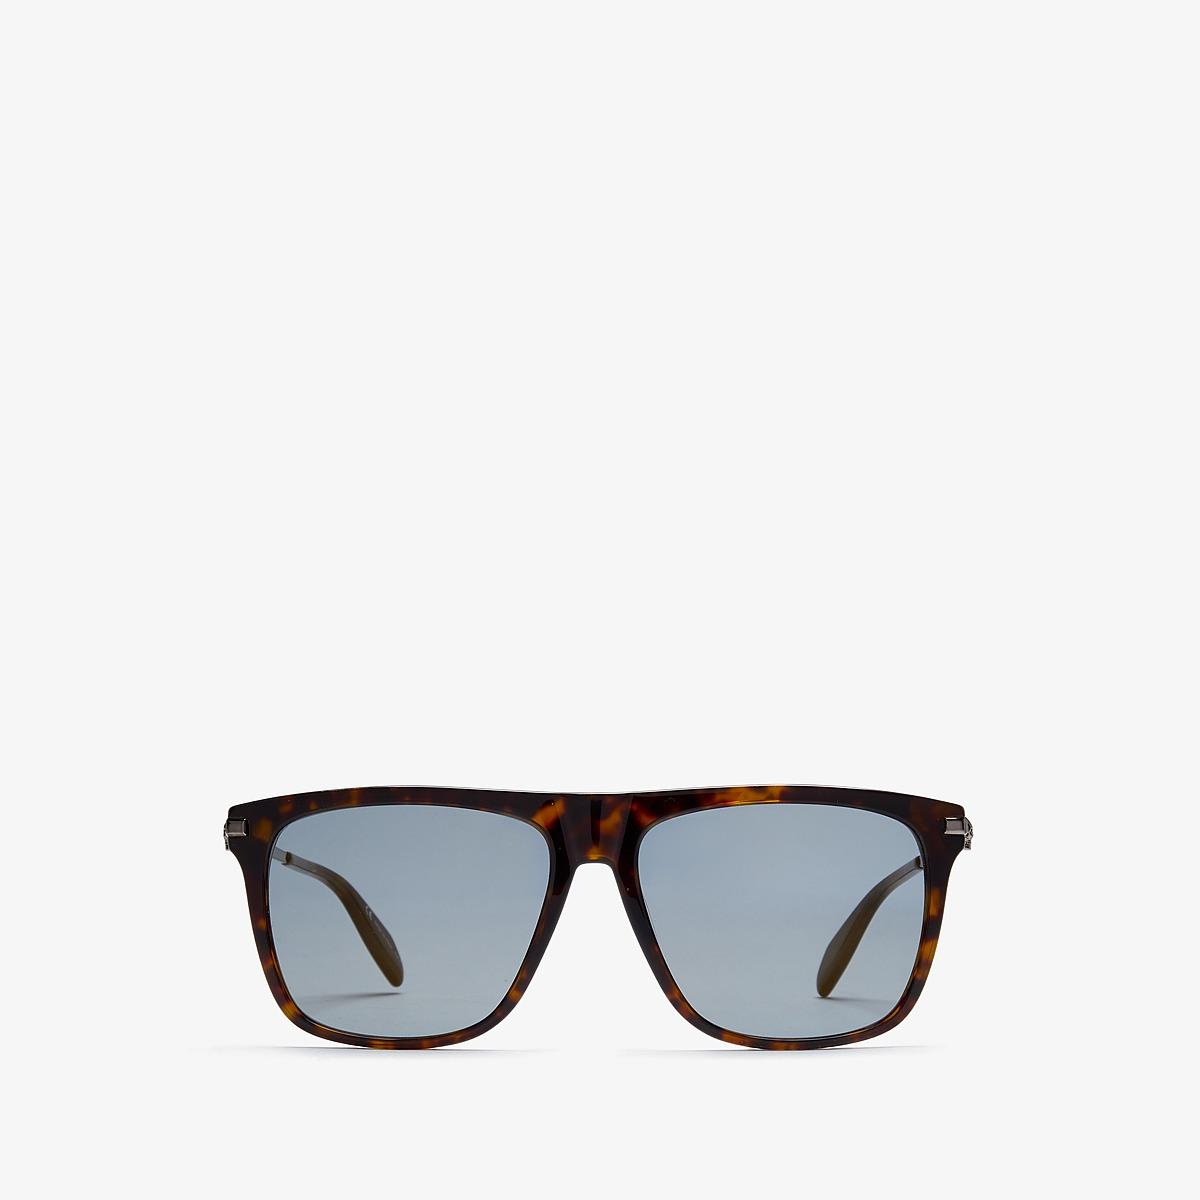 Alexander McQueen - AM0106SM (Havana/Bronze) Fashion Sunglasses